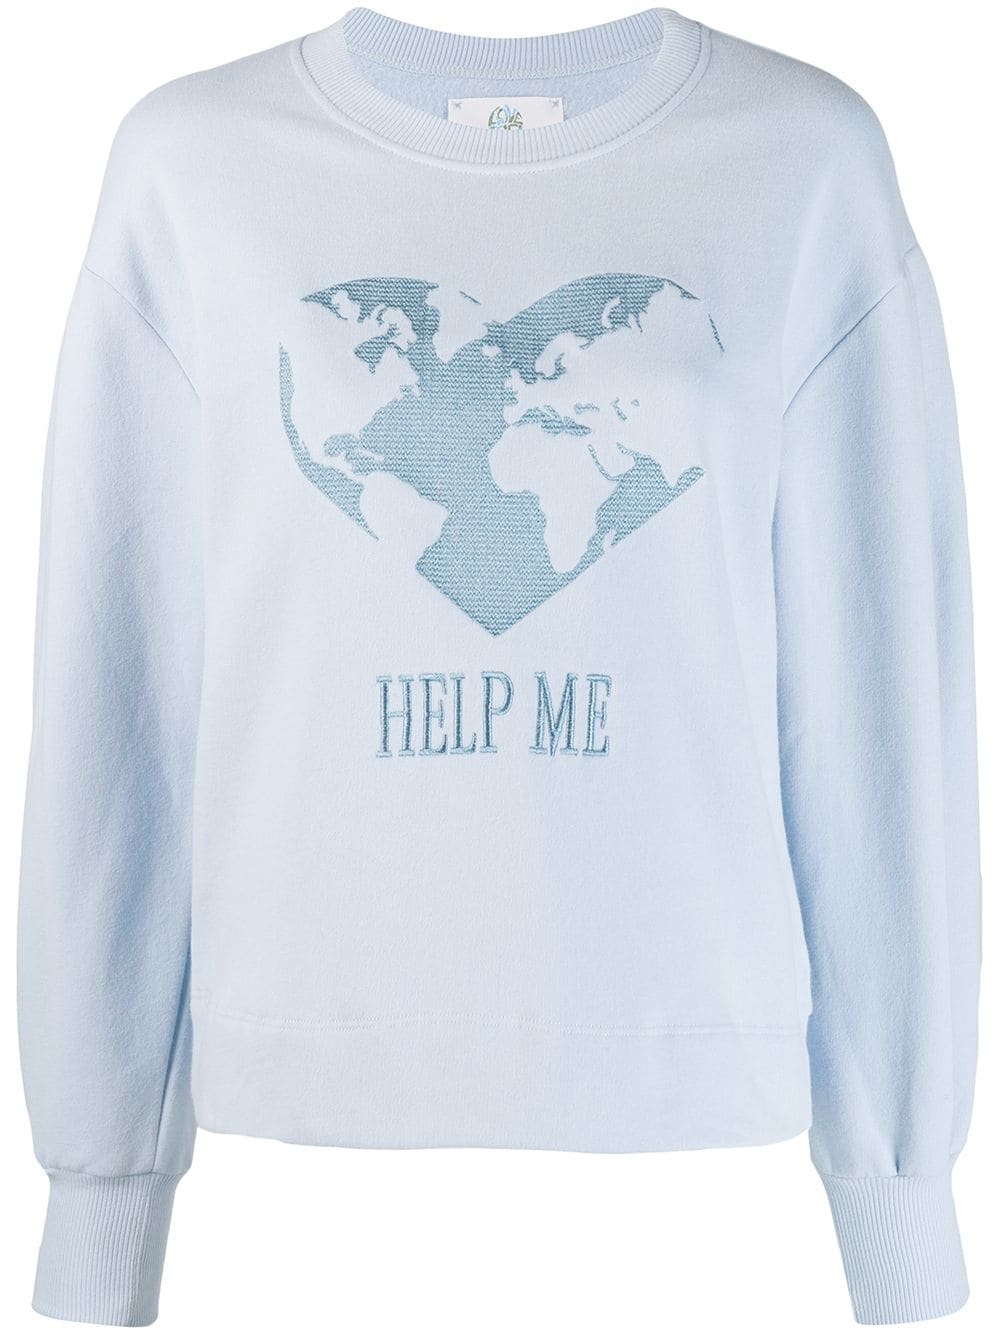 Alberta Ferretti Alberta Ferretti Help Me Sweatshirt Blue Albertaferretti Cloth Sweatshirts Alberta Ferretti Philosophy Di Alberta Ferretti